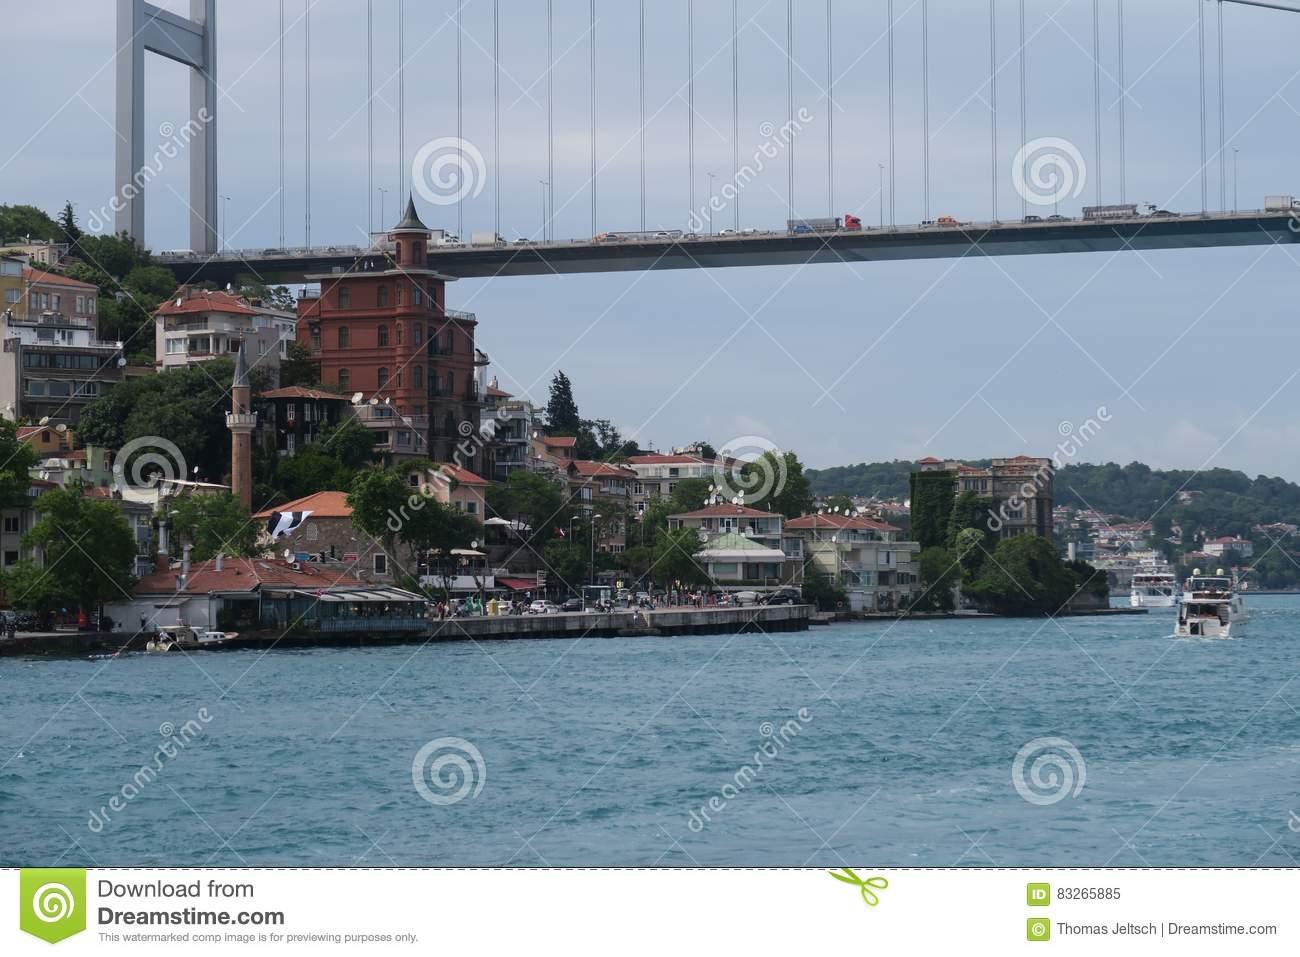 Fatih Sultan Mehmet Bridge.